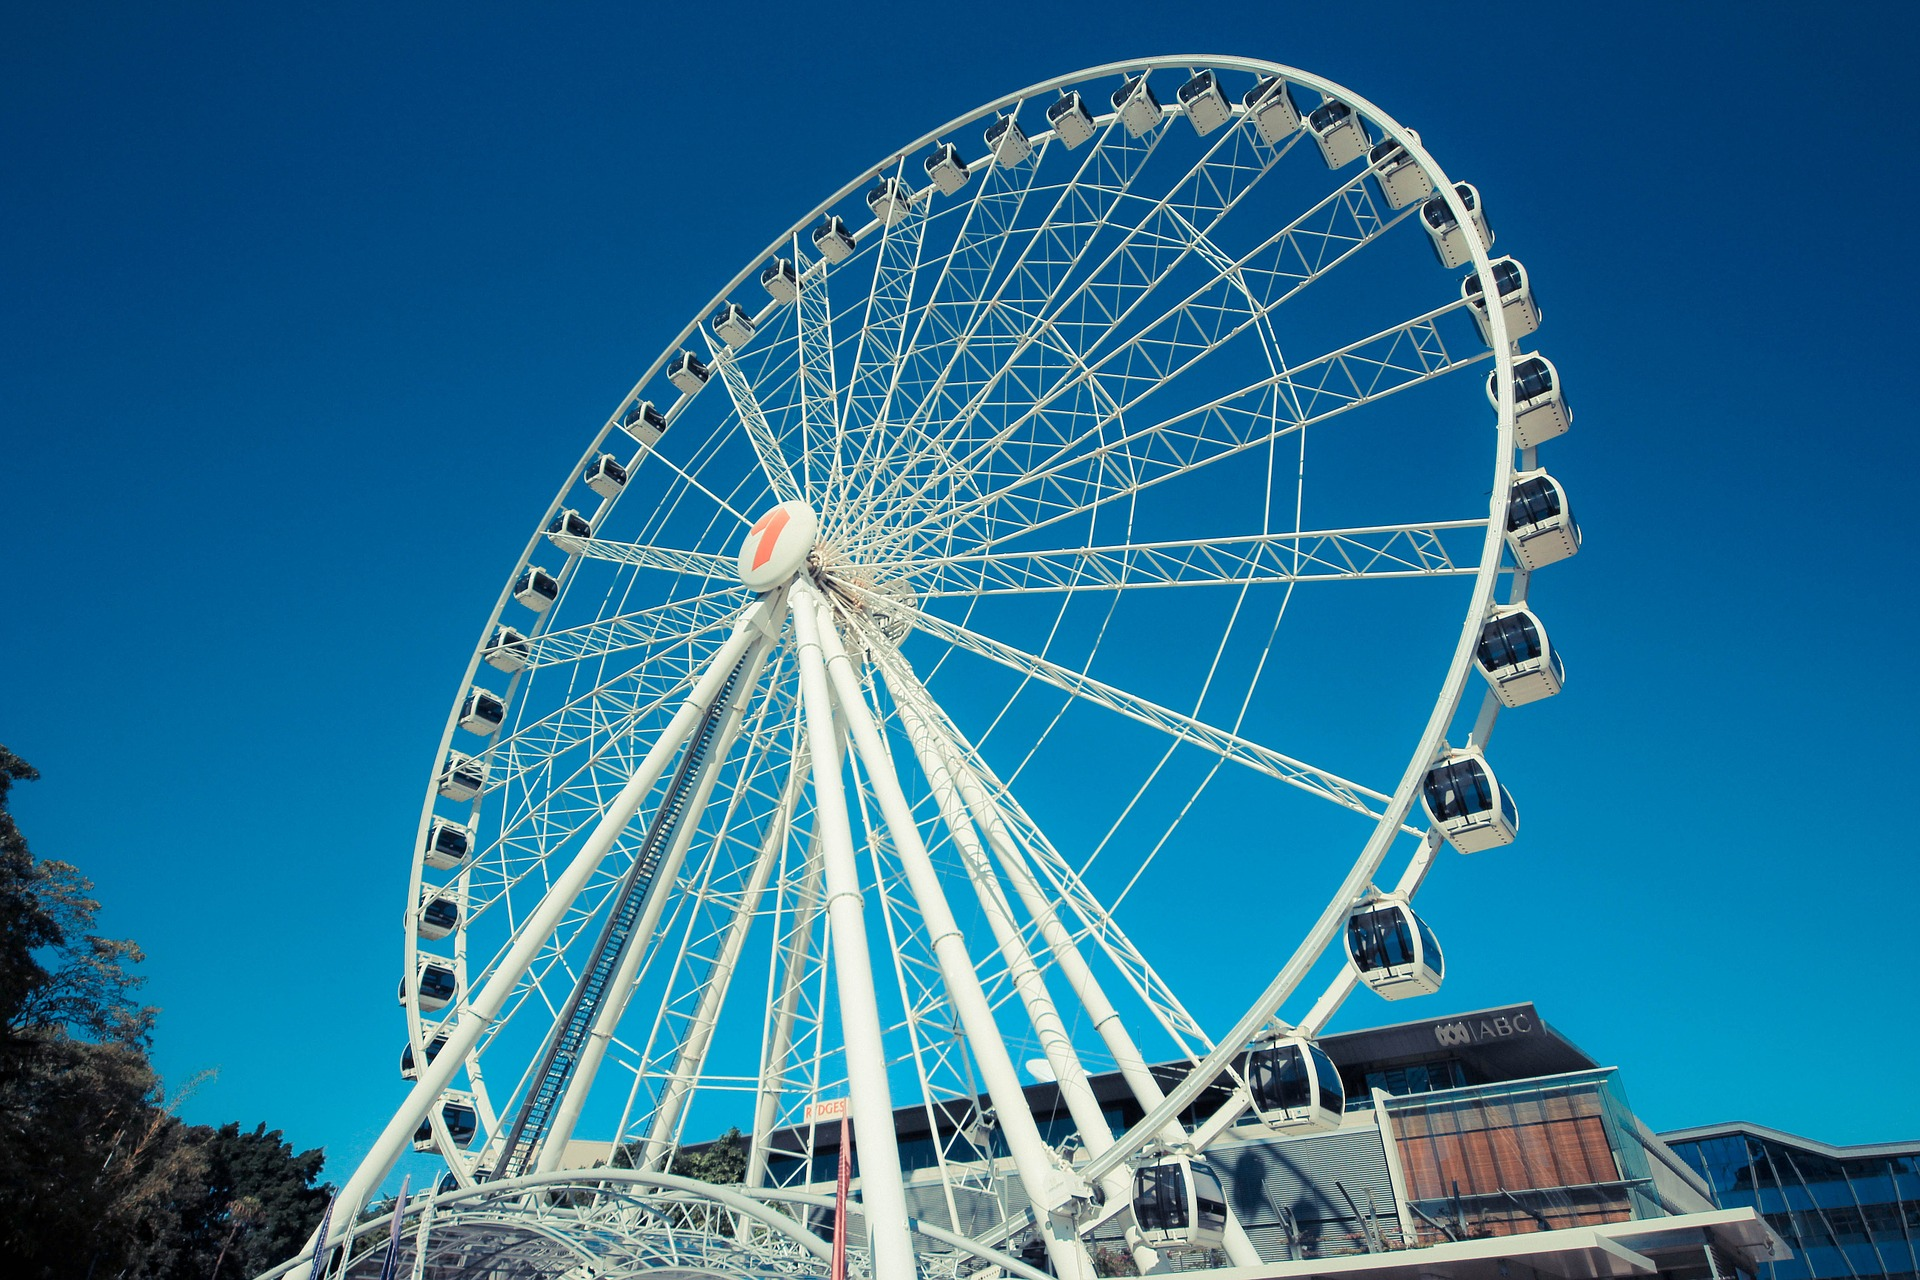 the-ferris-wheel-866405_1920